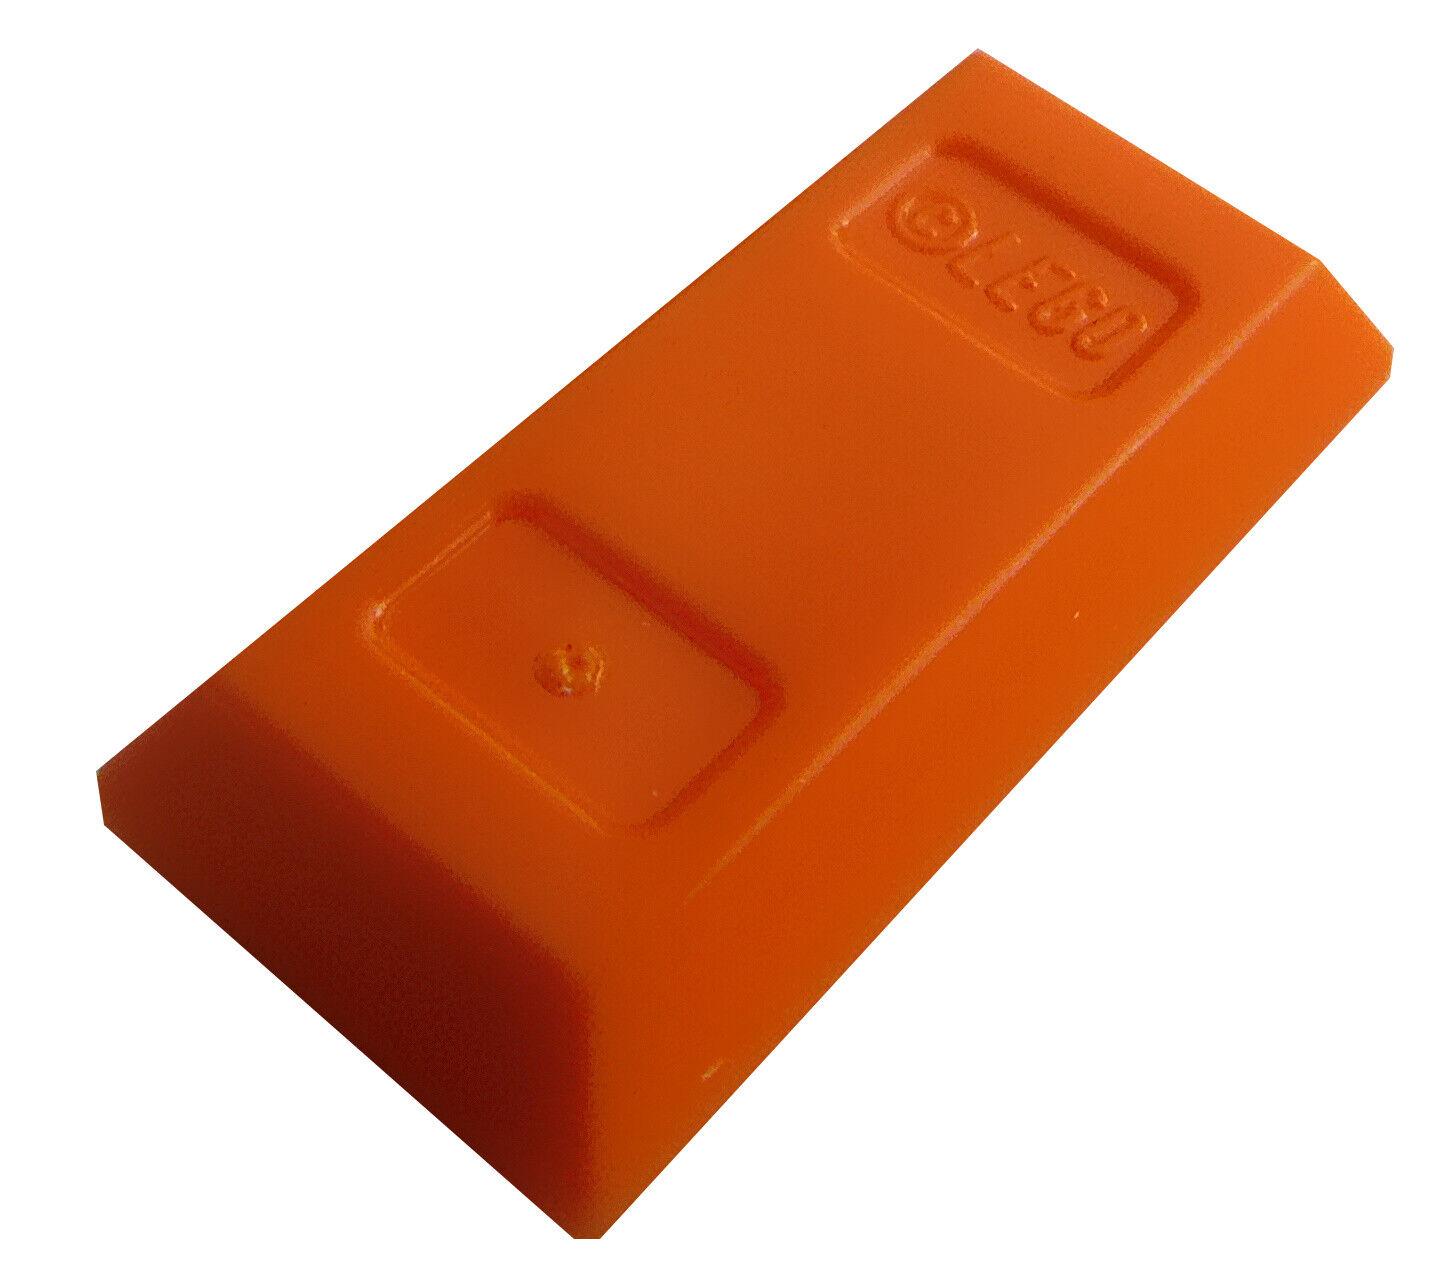 Lego 10 Stück Barren in perl dunkel grau 99563 Neu Zubehör City Friends